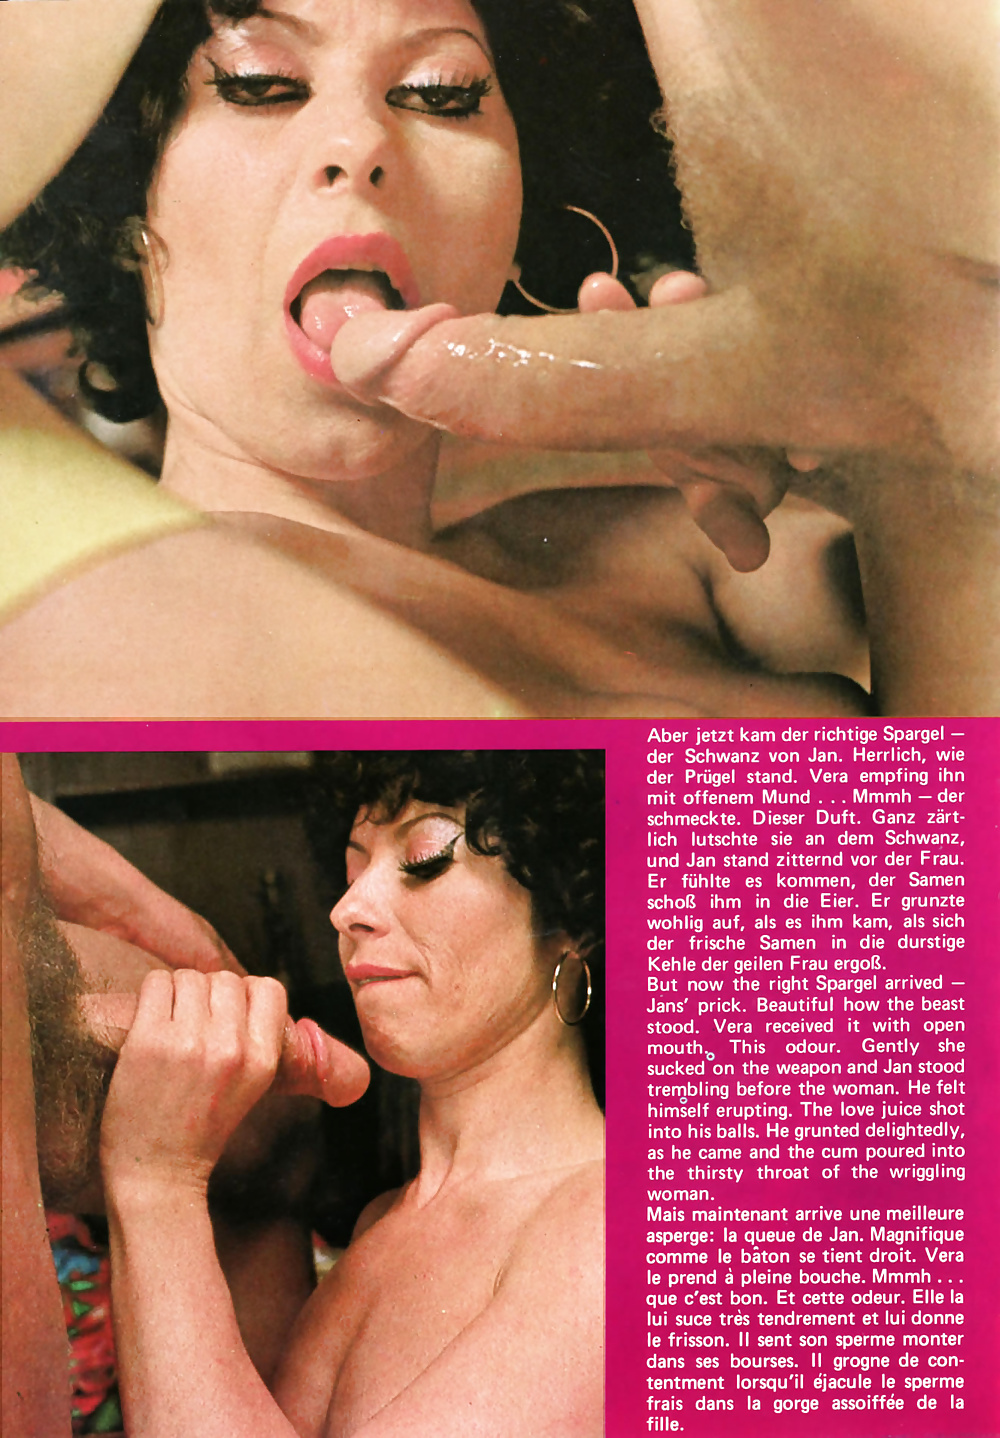 video-black-porn-magazine-union-lesbians-naked-paula